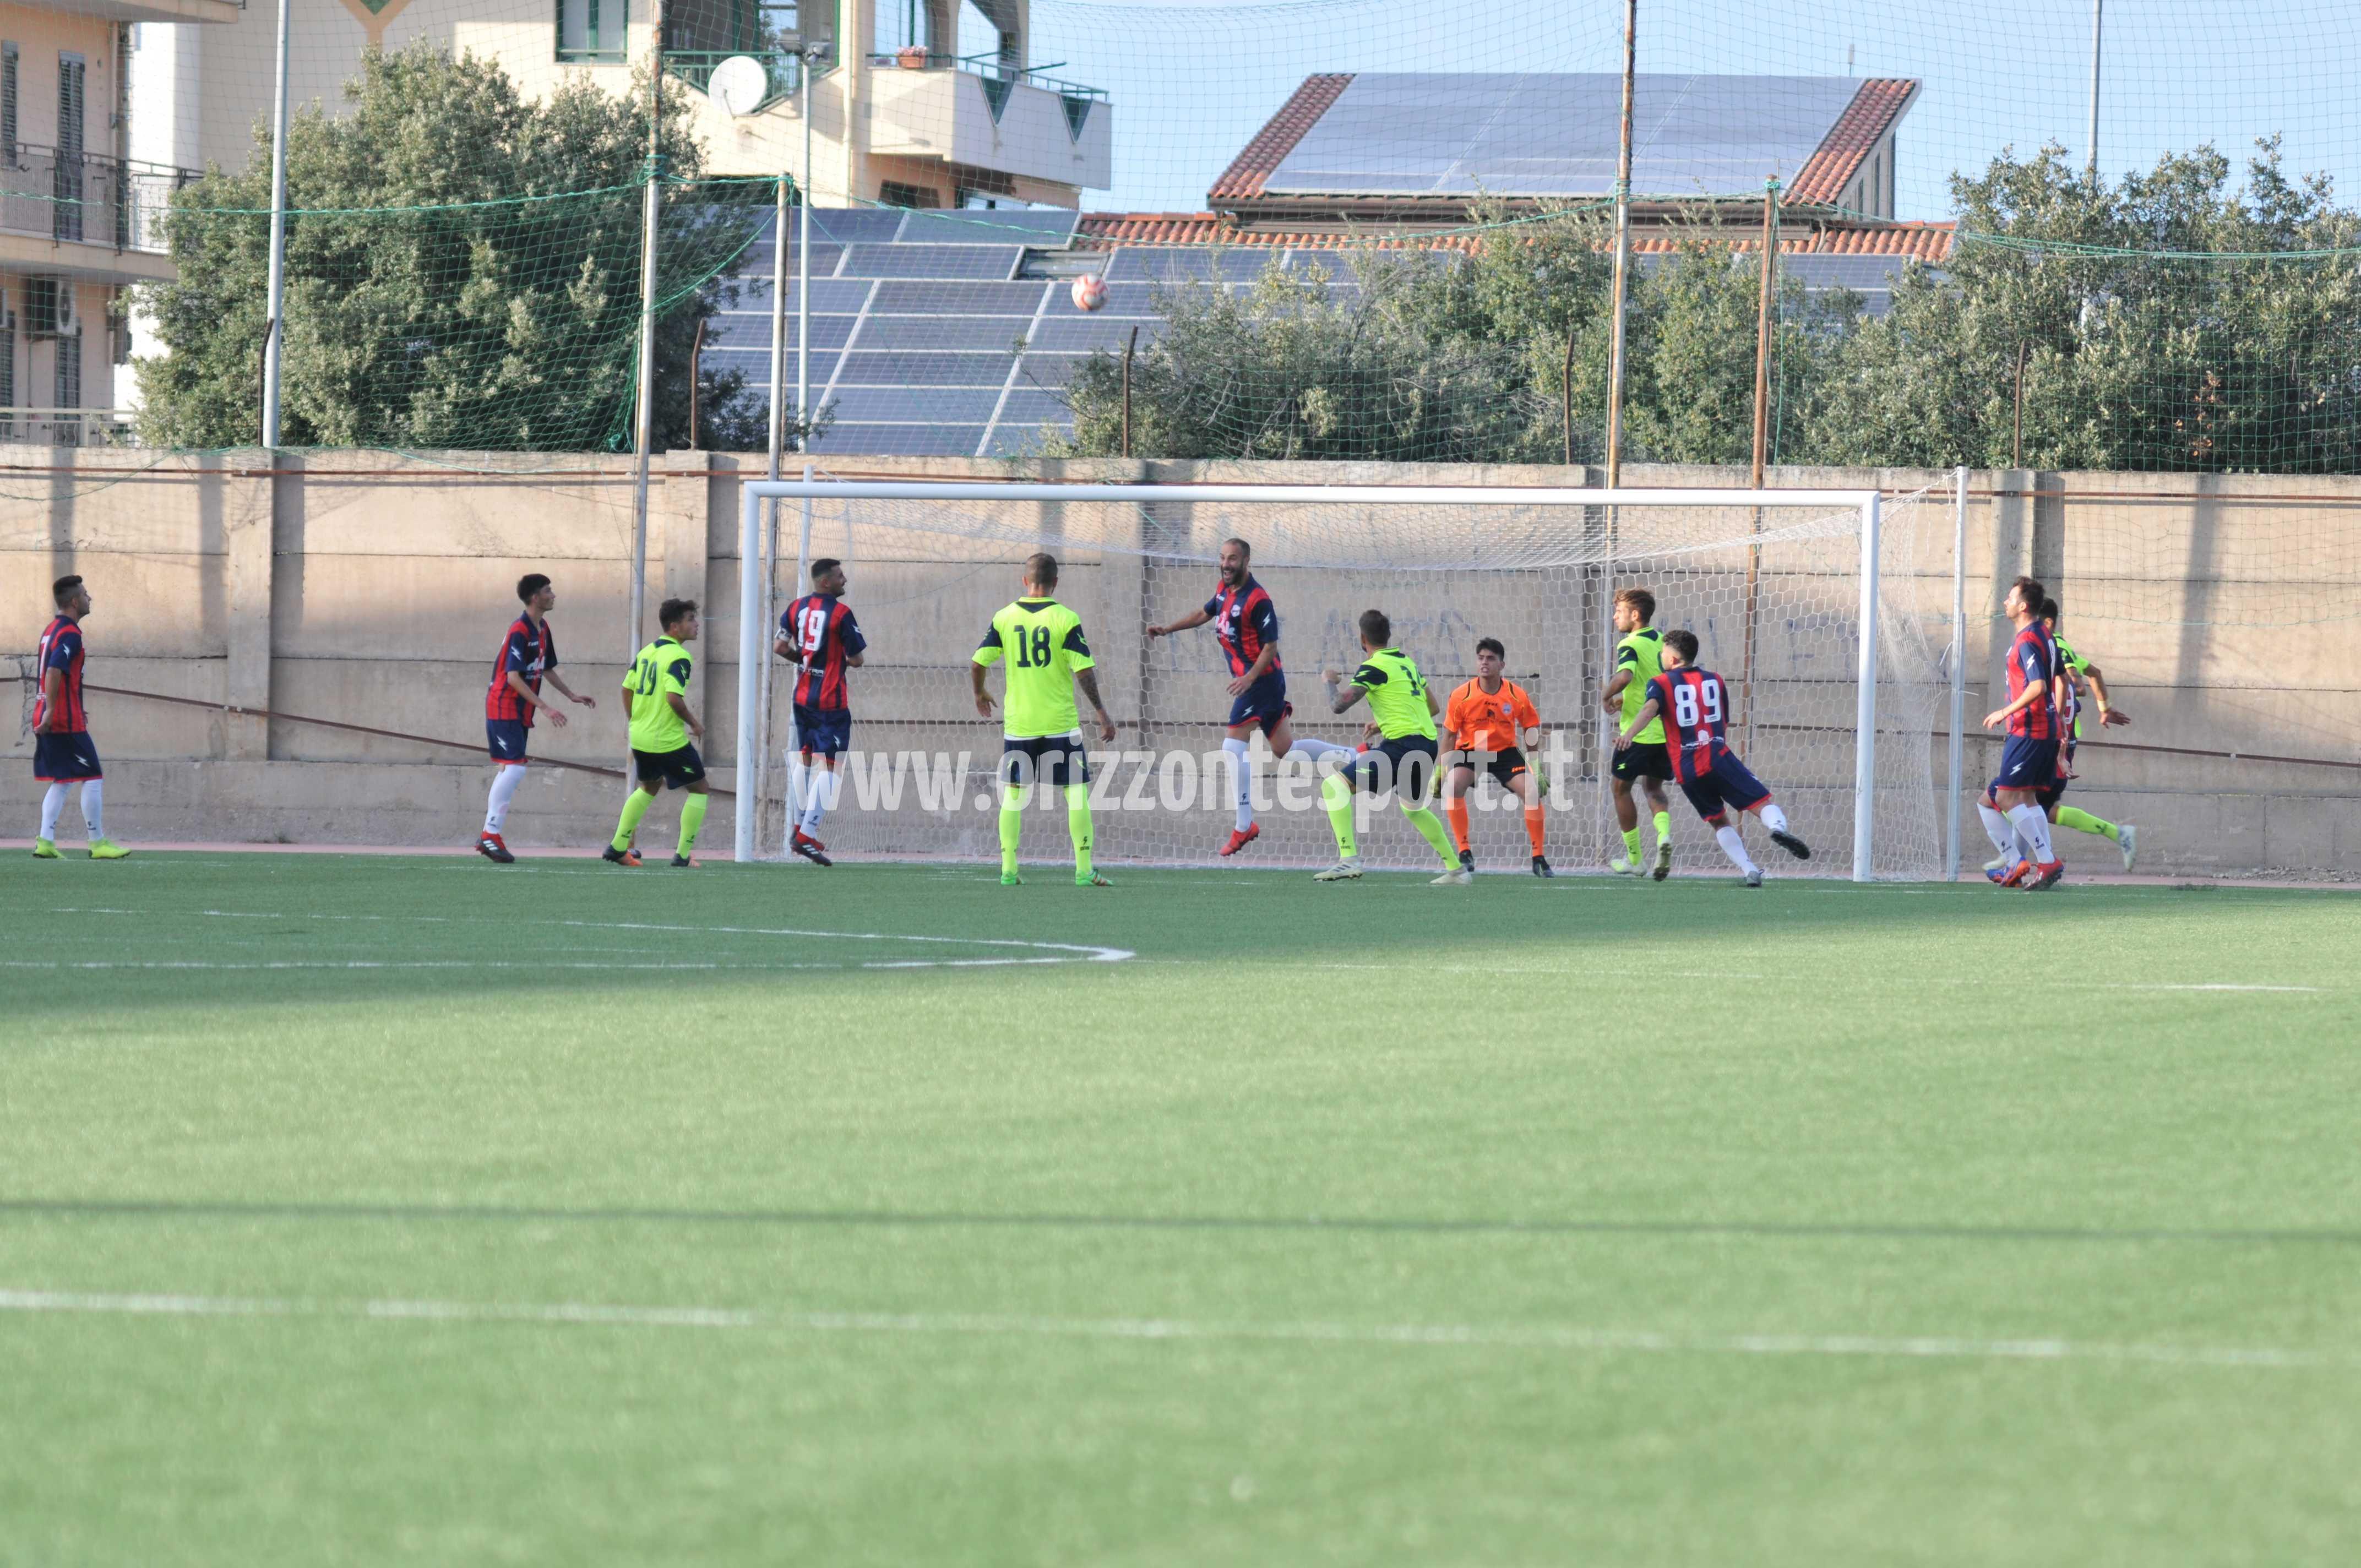 rossanese_praiatrtora_cpppa_italia (145)